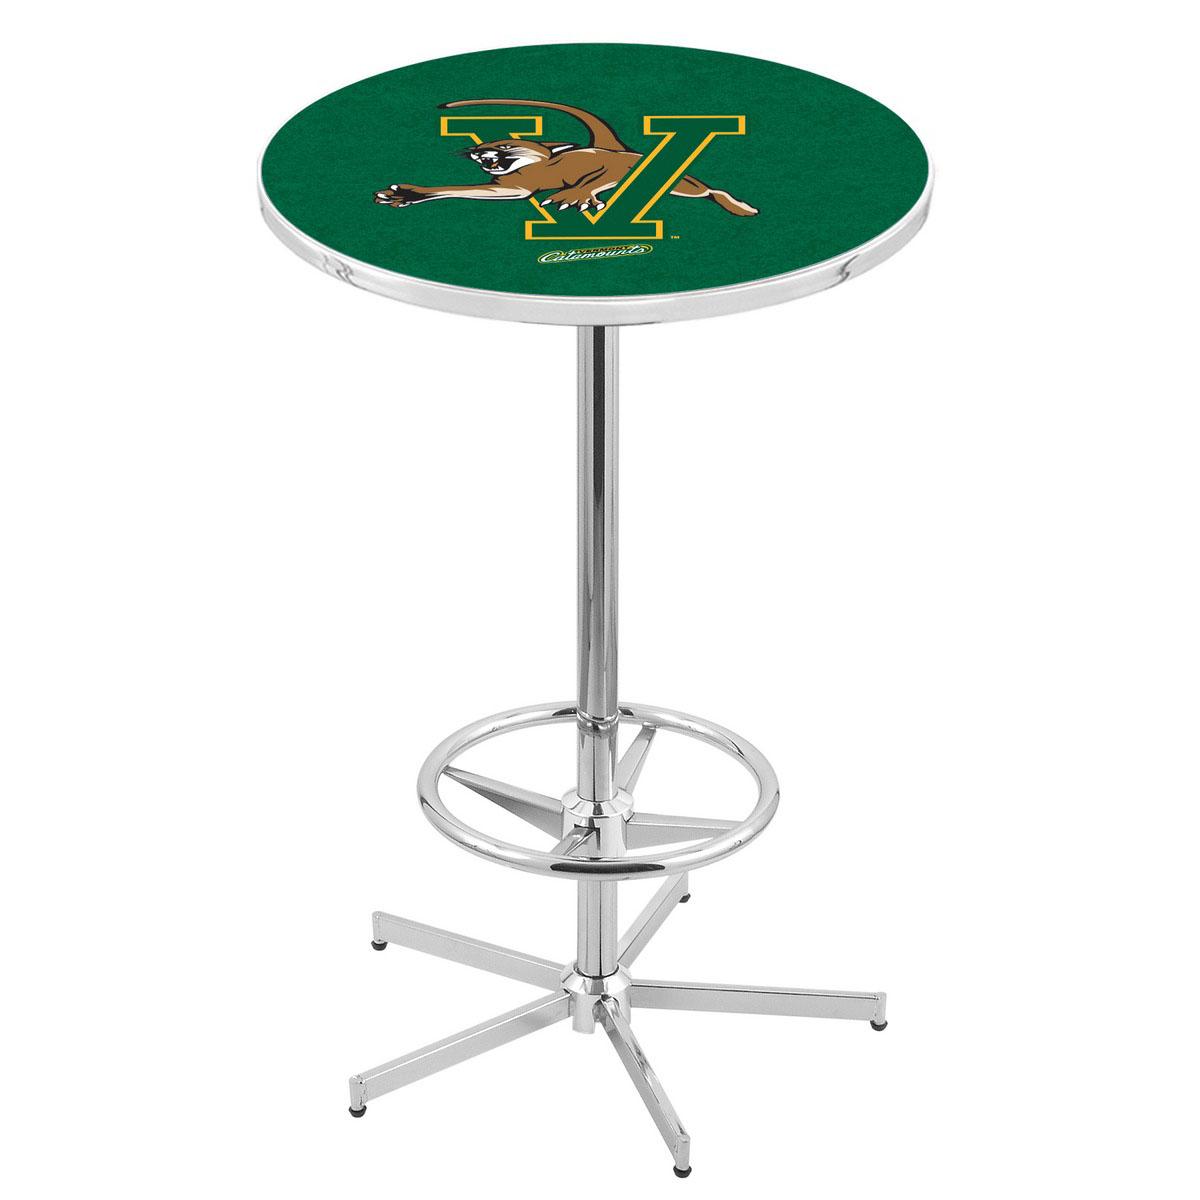 Buy Chrome Vermont Pub Table Product Photo